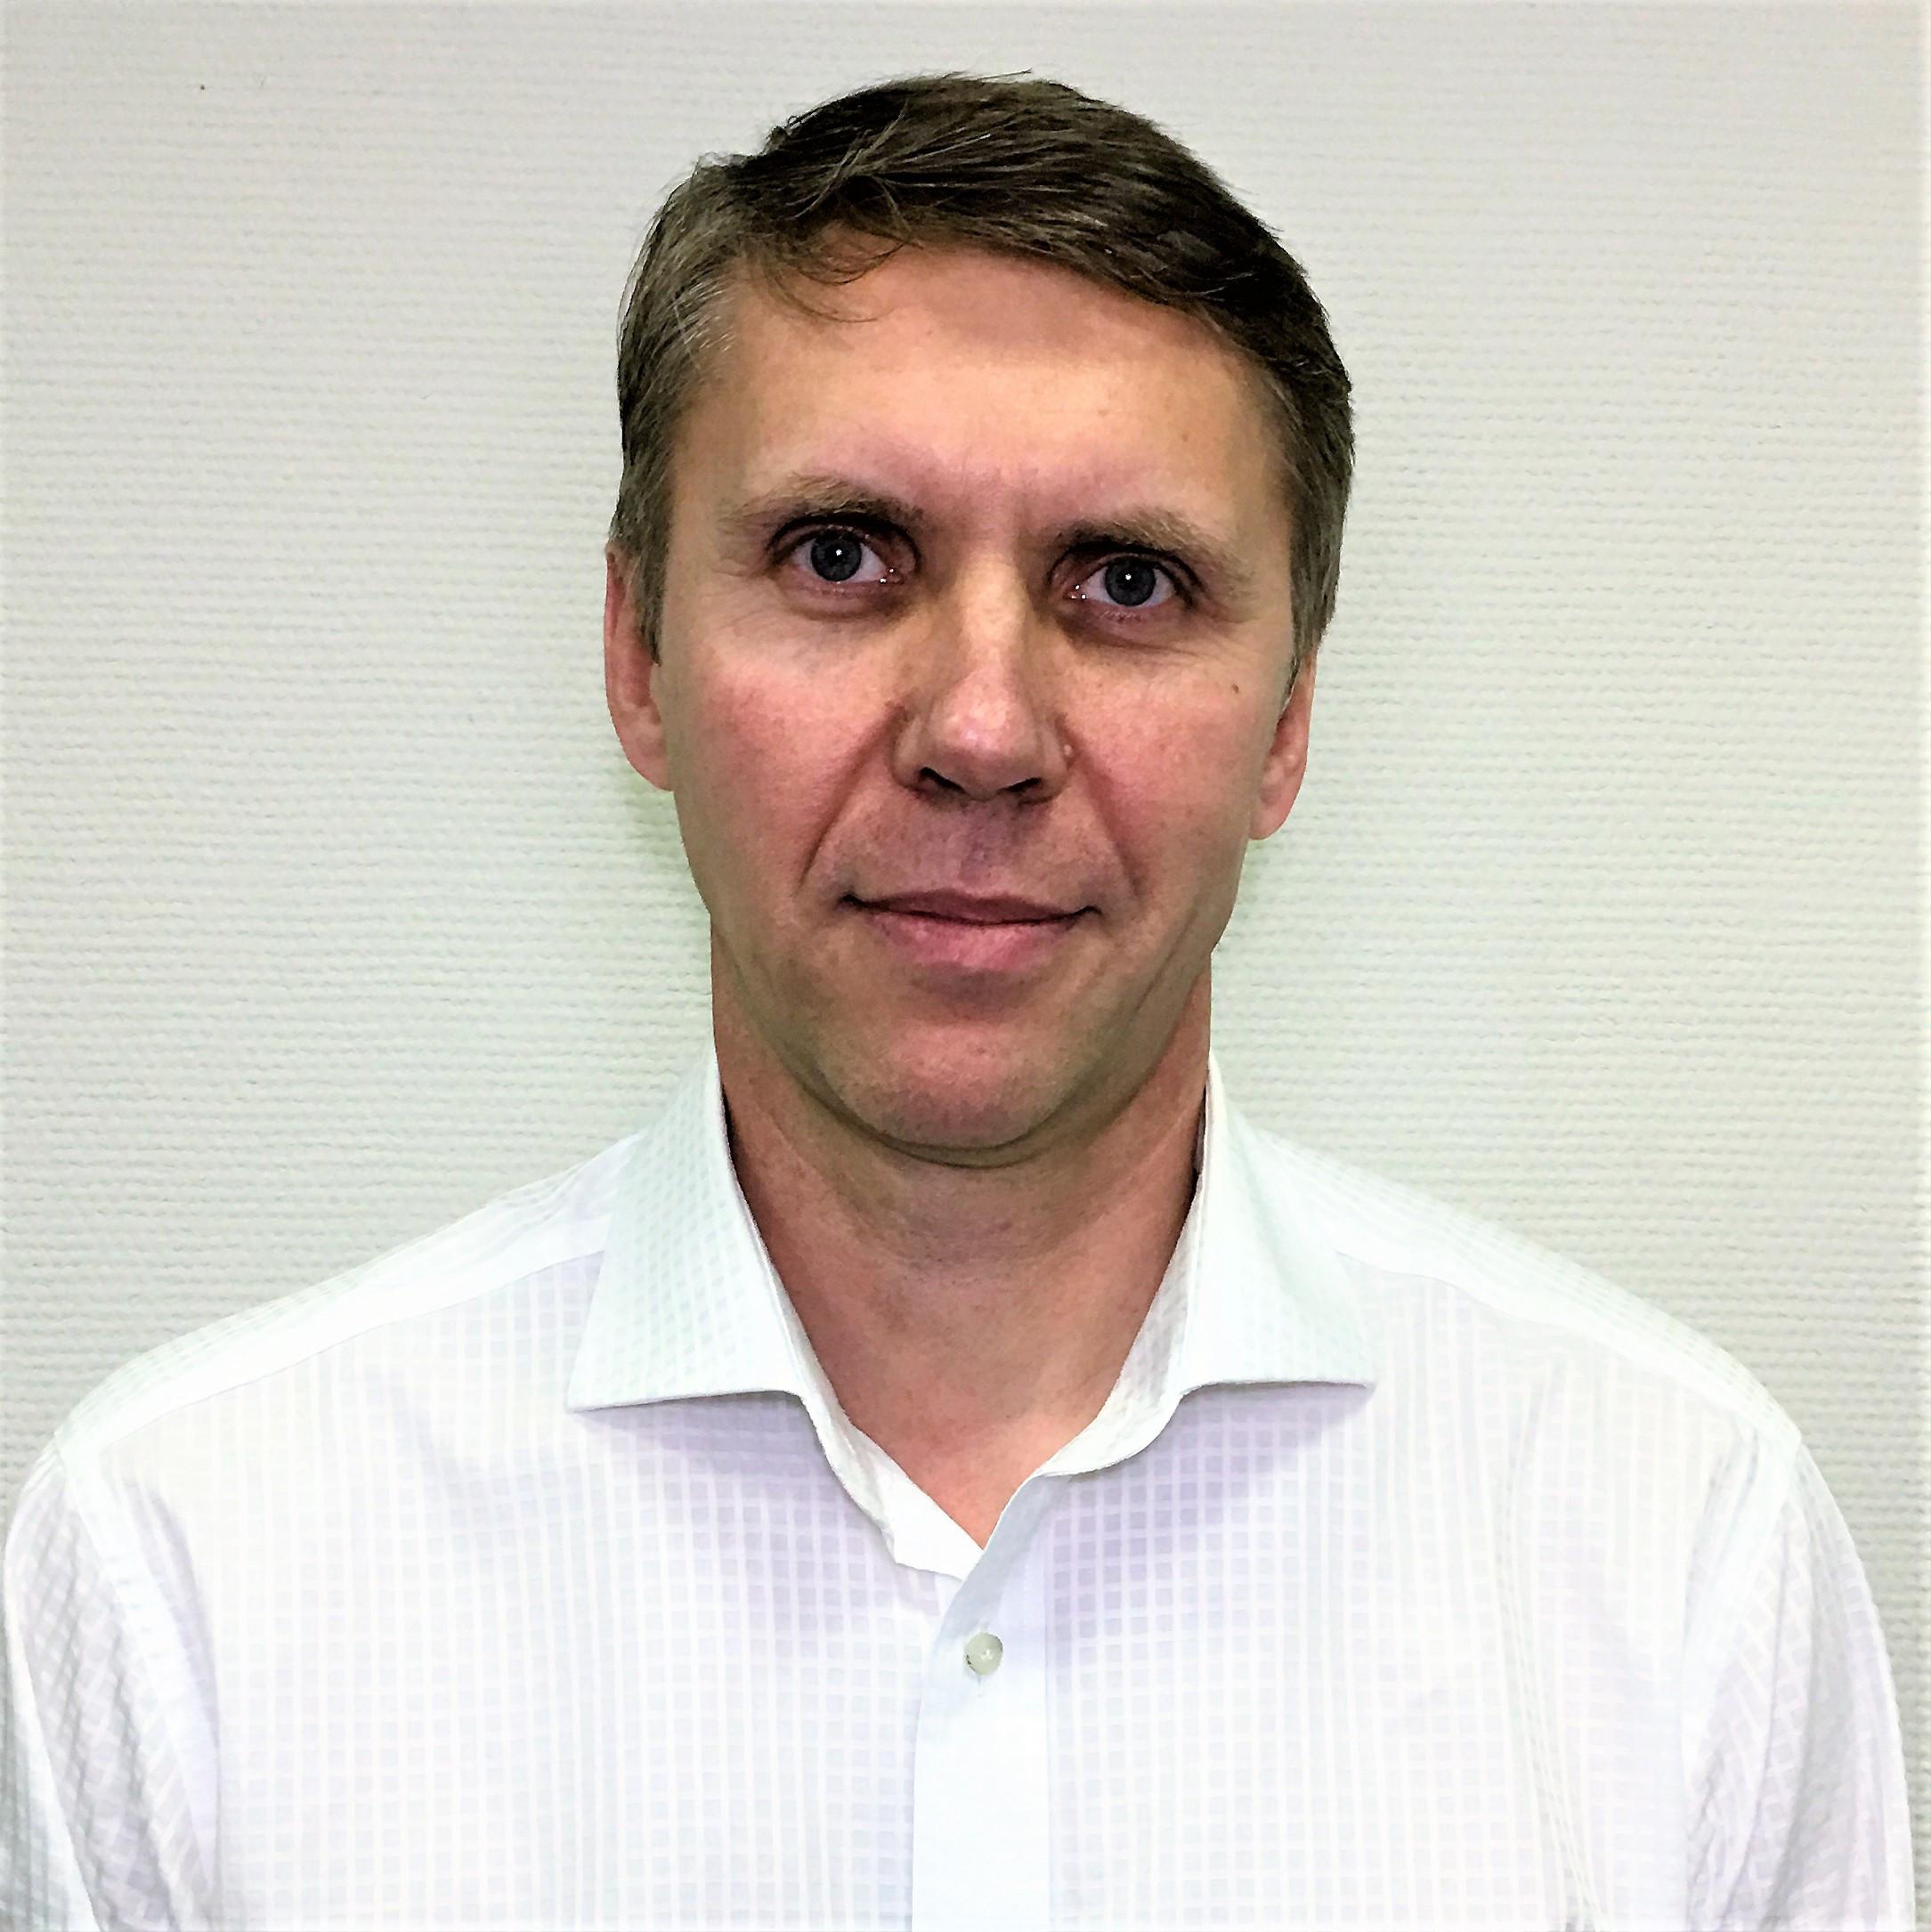 Хворостов Евгений